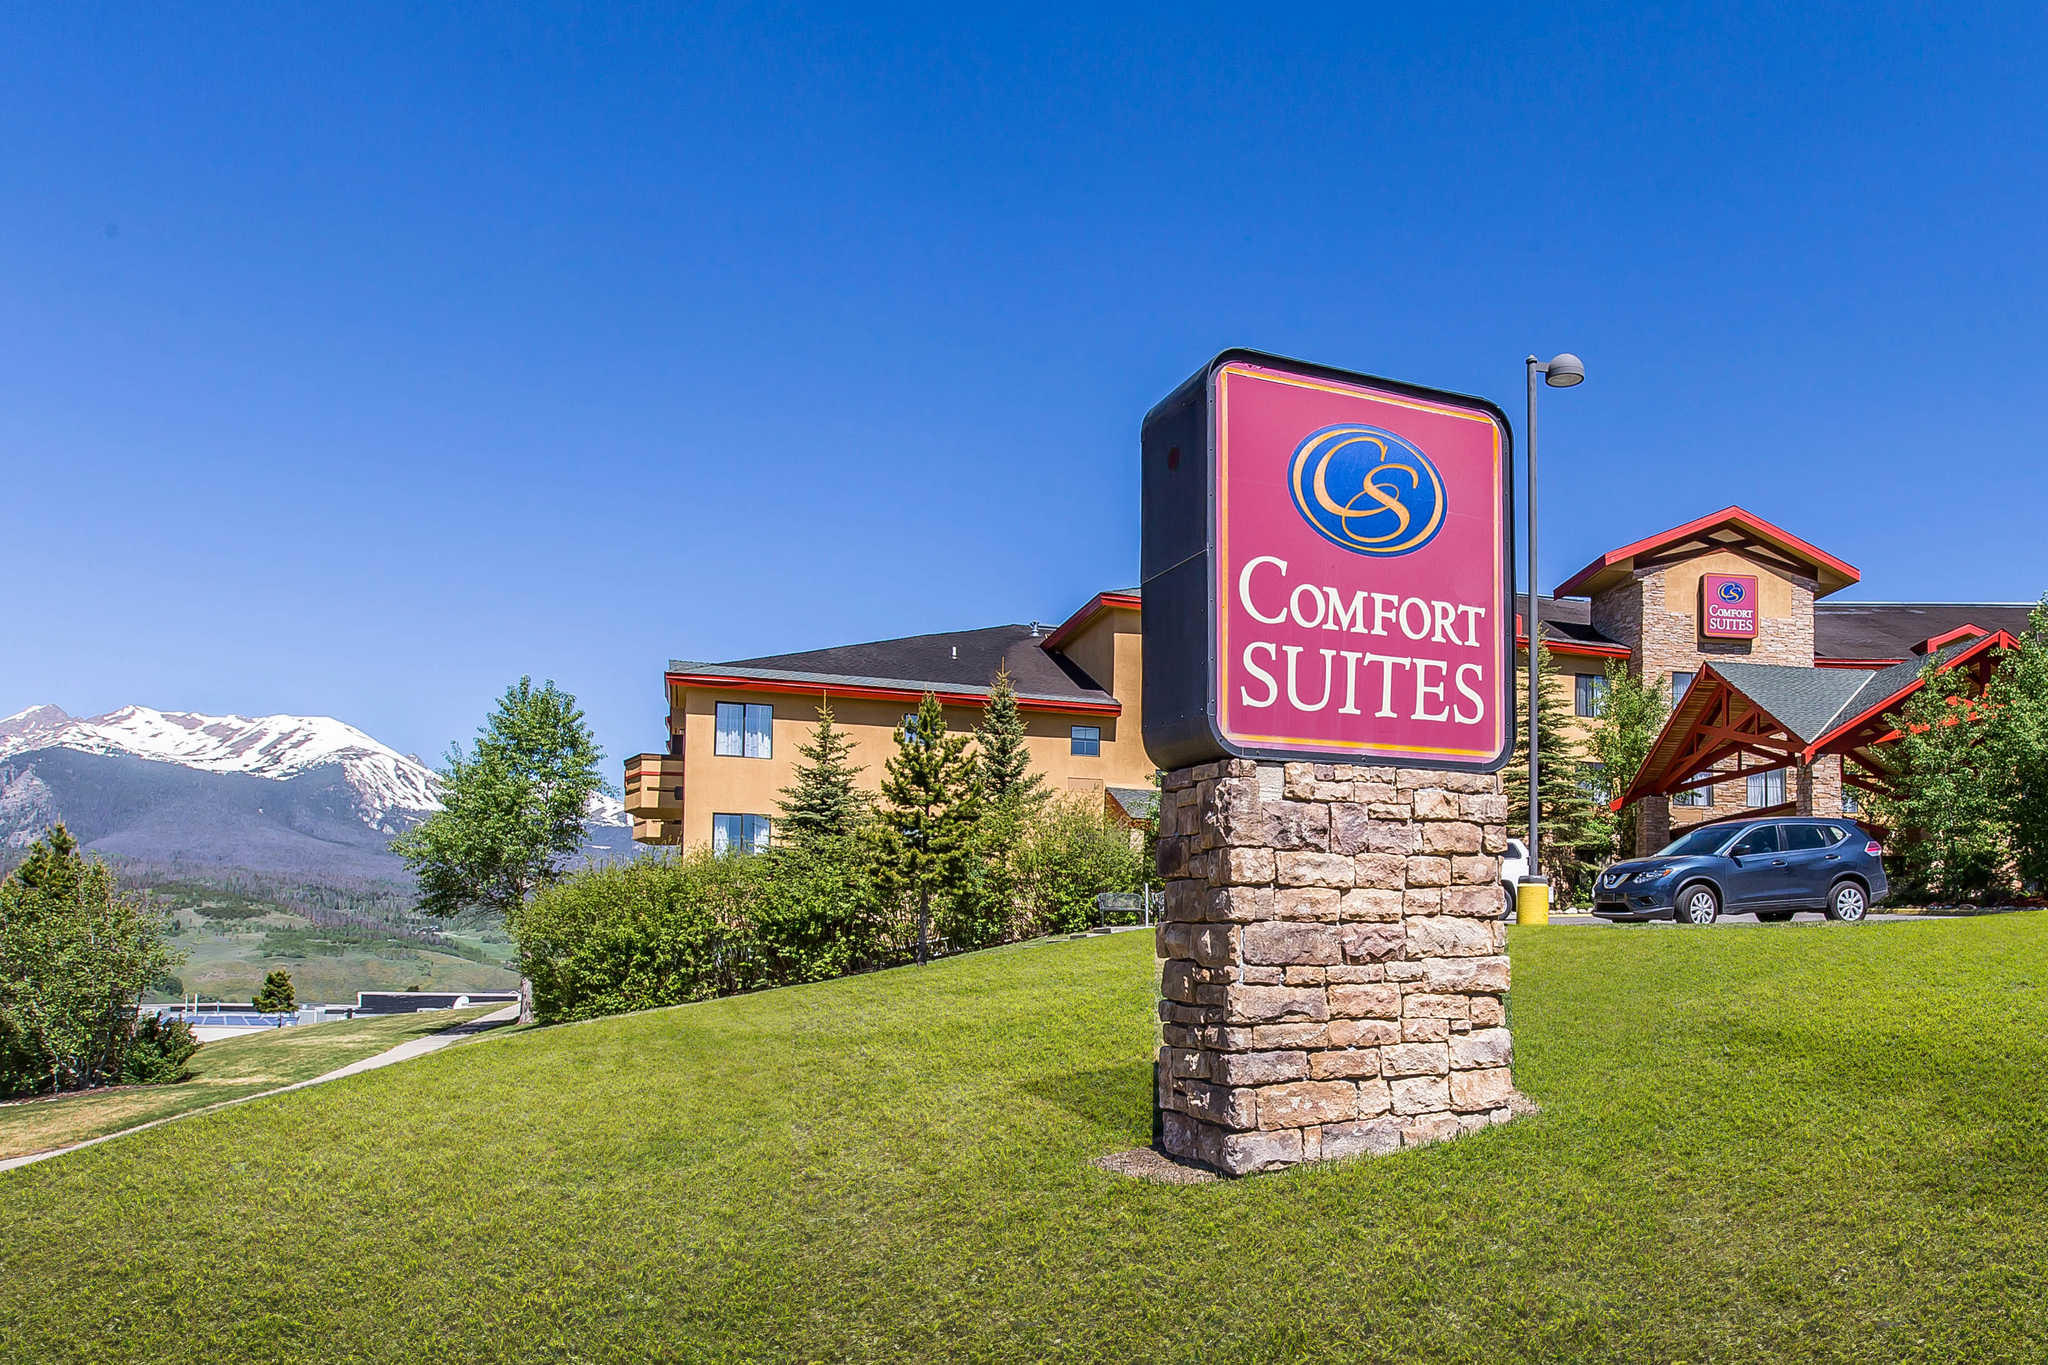 Comfort Suites Summit County image 1